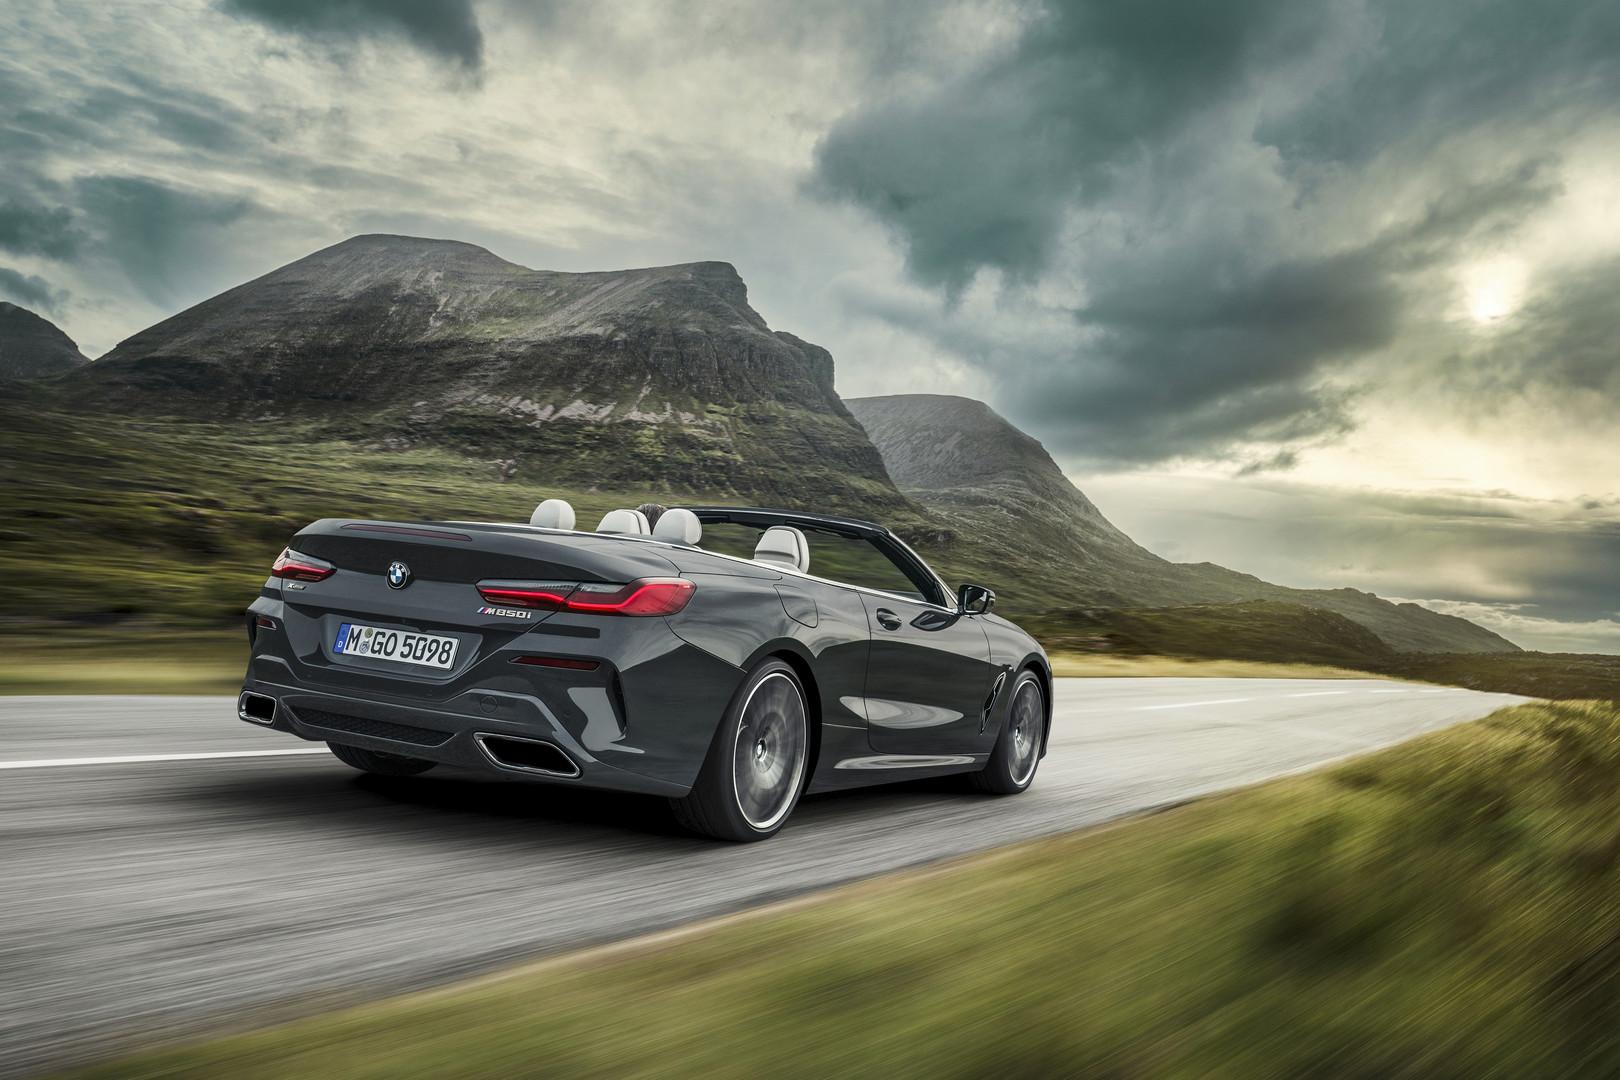 2019 BMW 8 Series Convertible